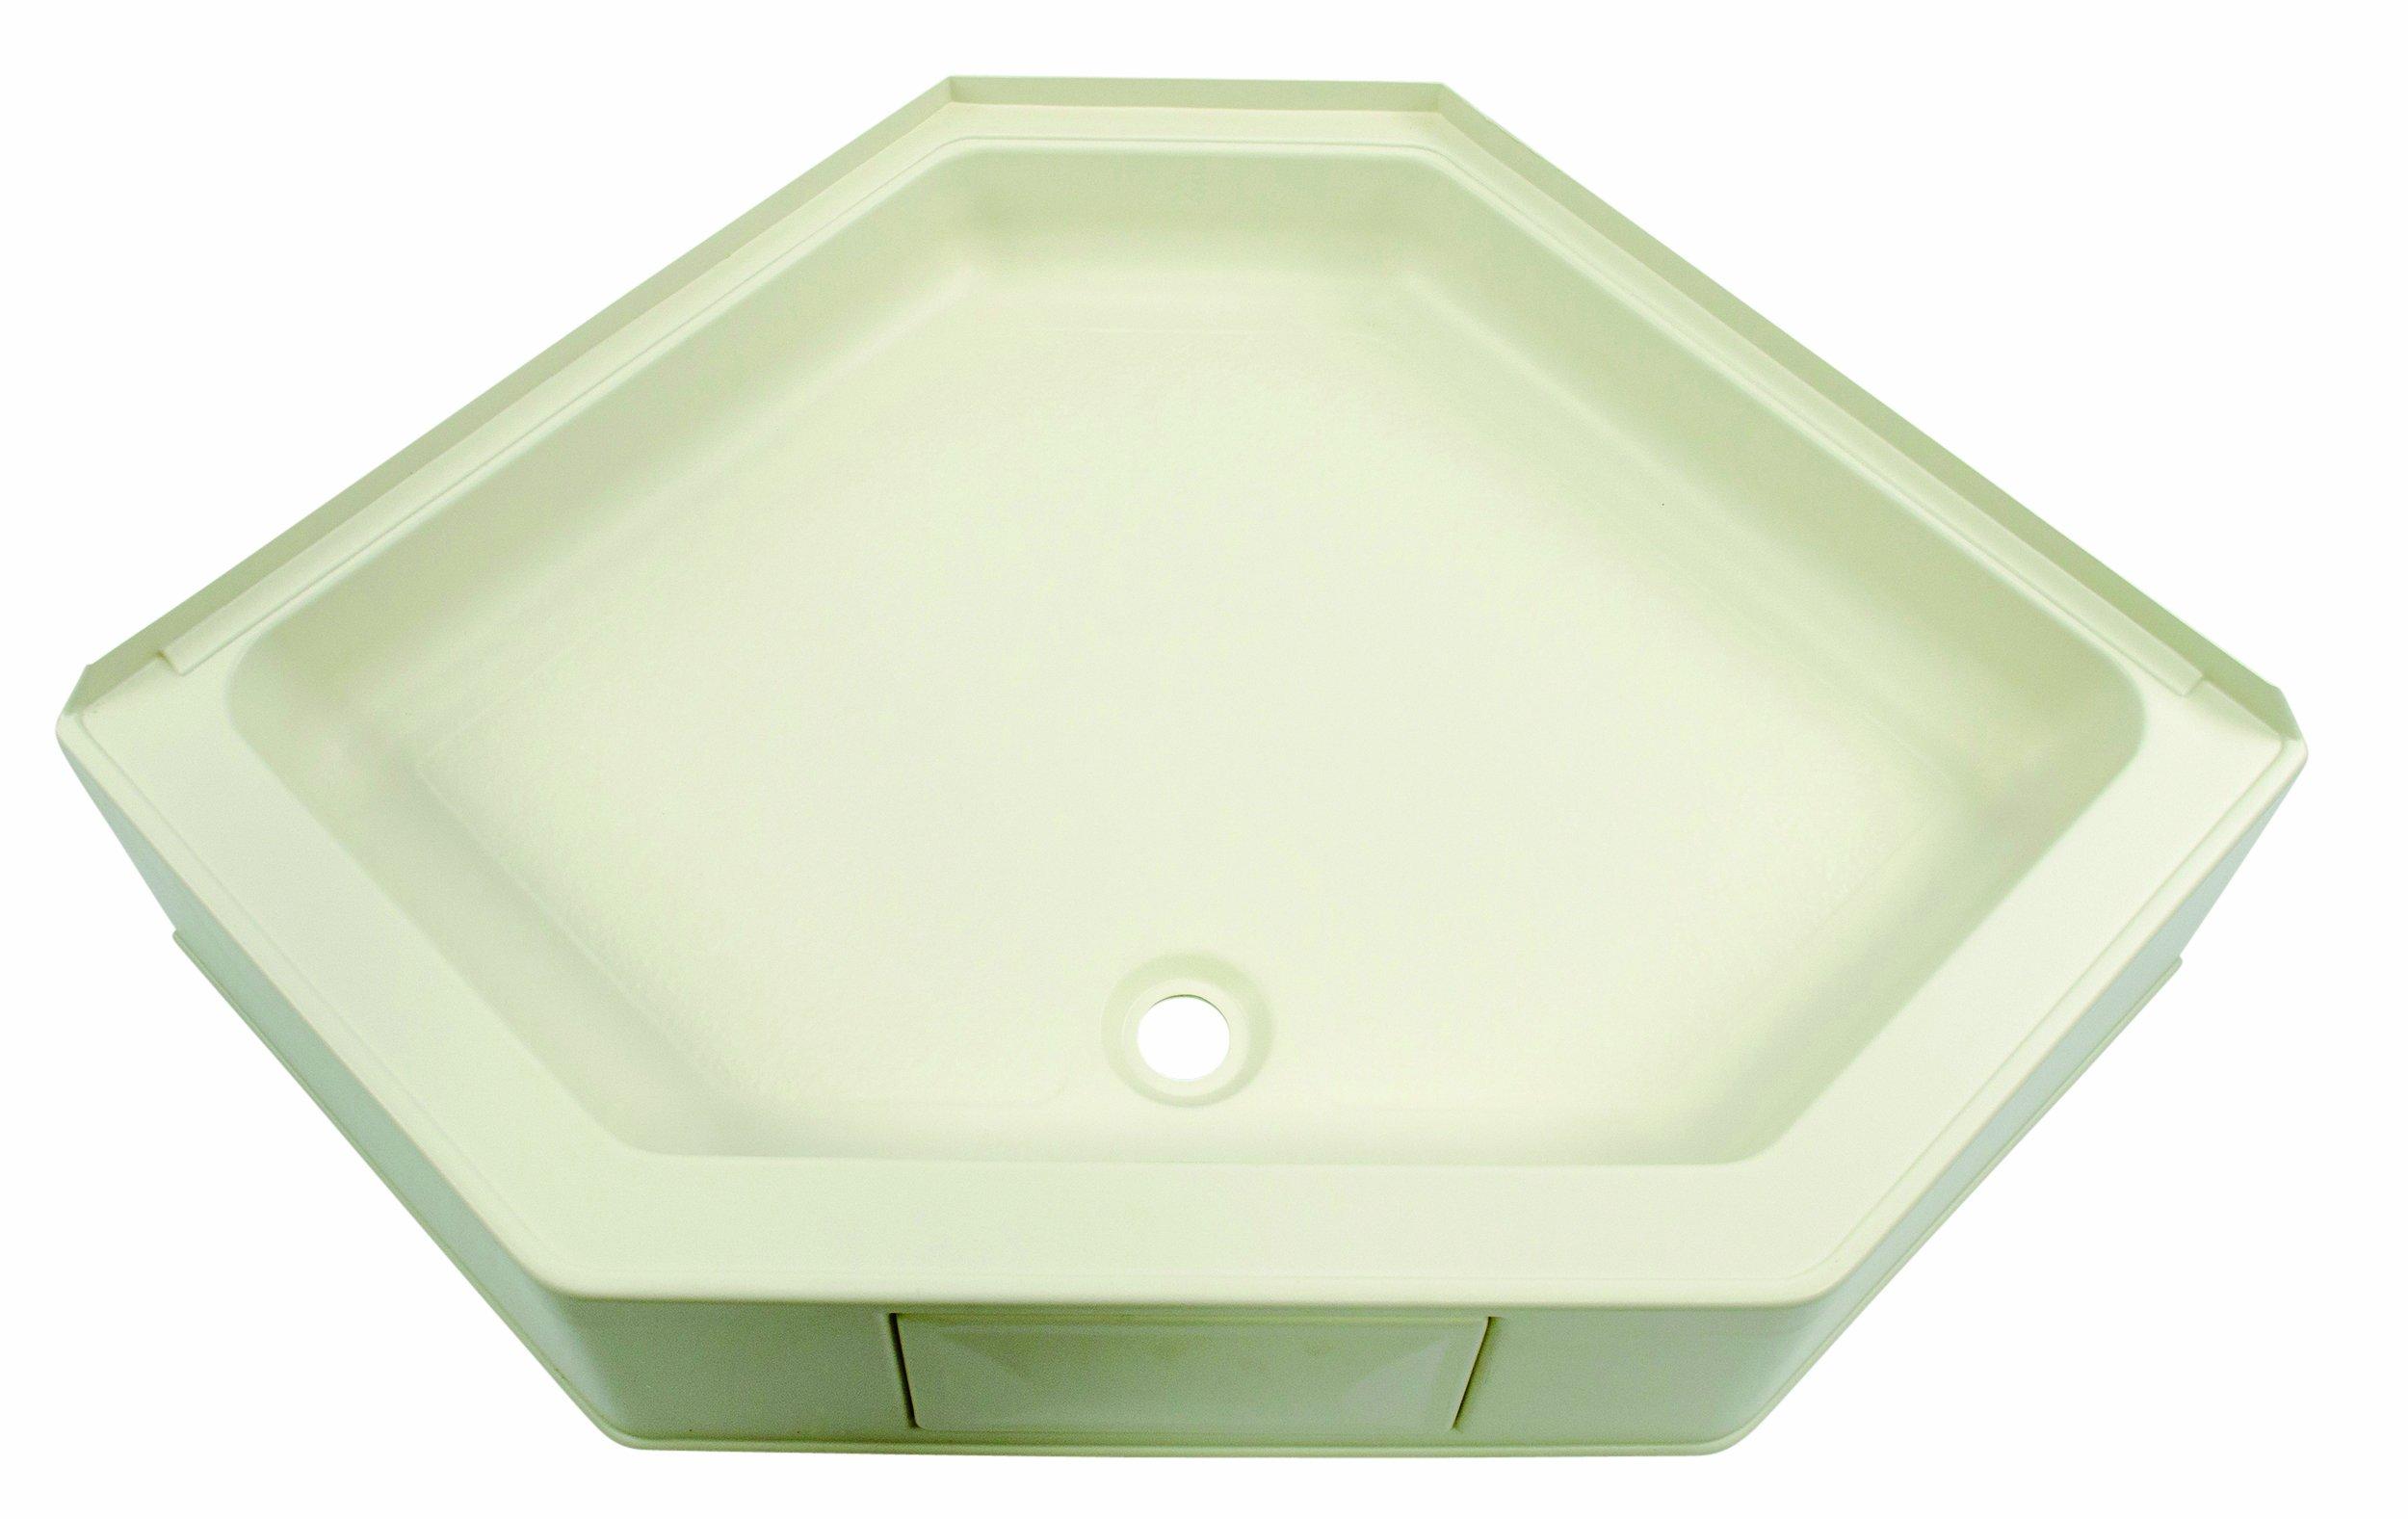 Lippert 301242 Better Bath 34'' x 34'' Neo Angle RV Shower Pan Center Drain Parchment